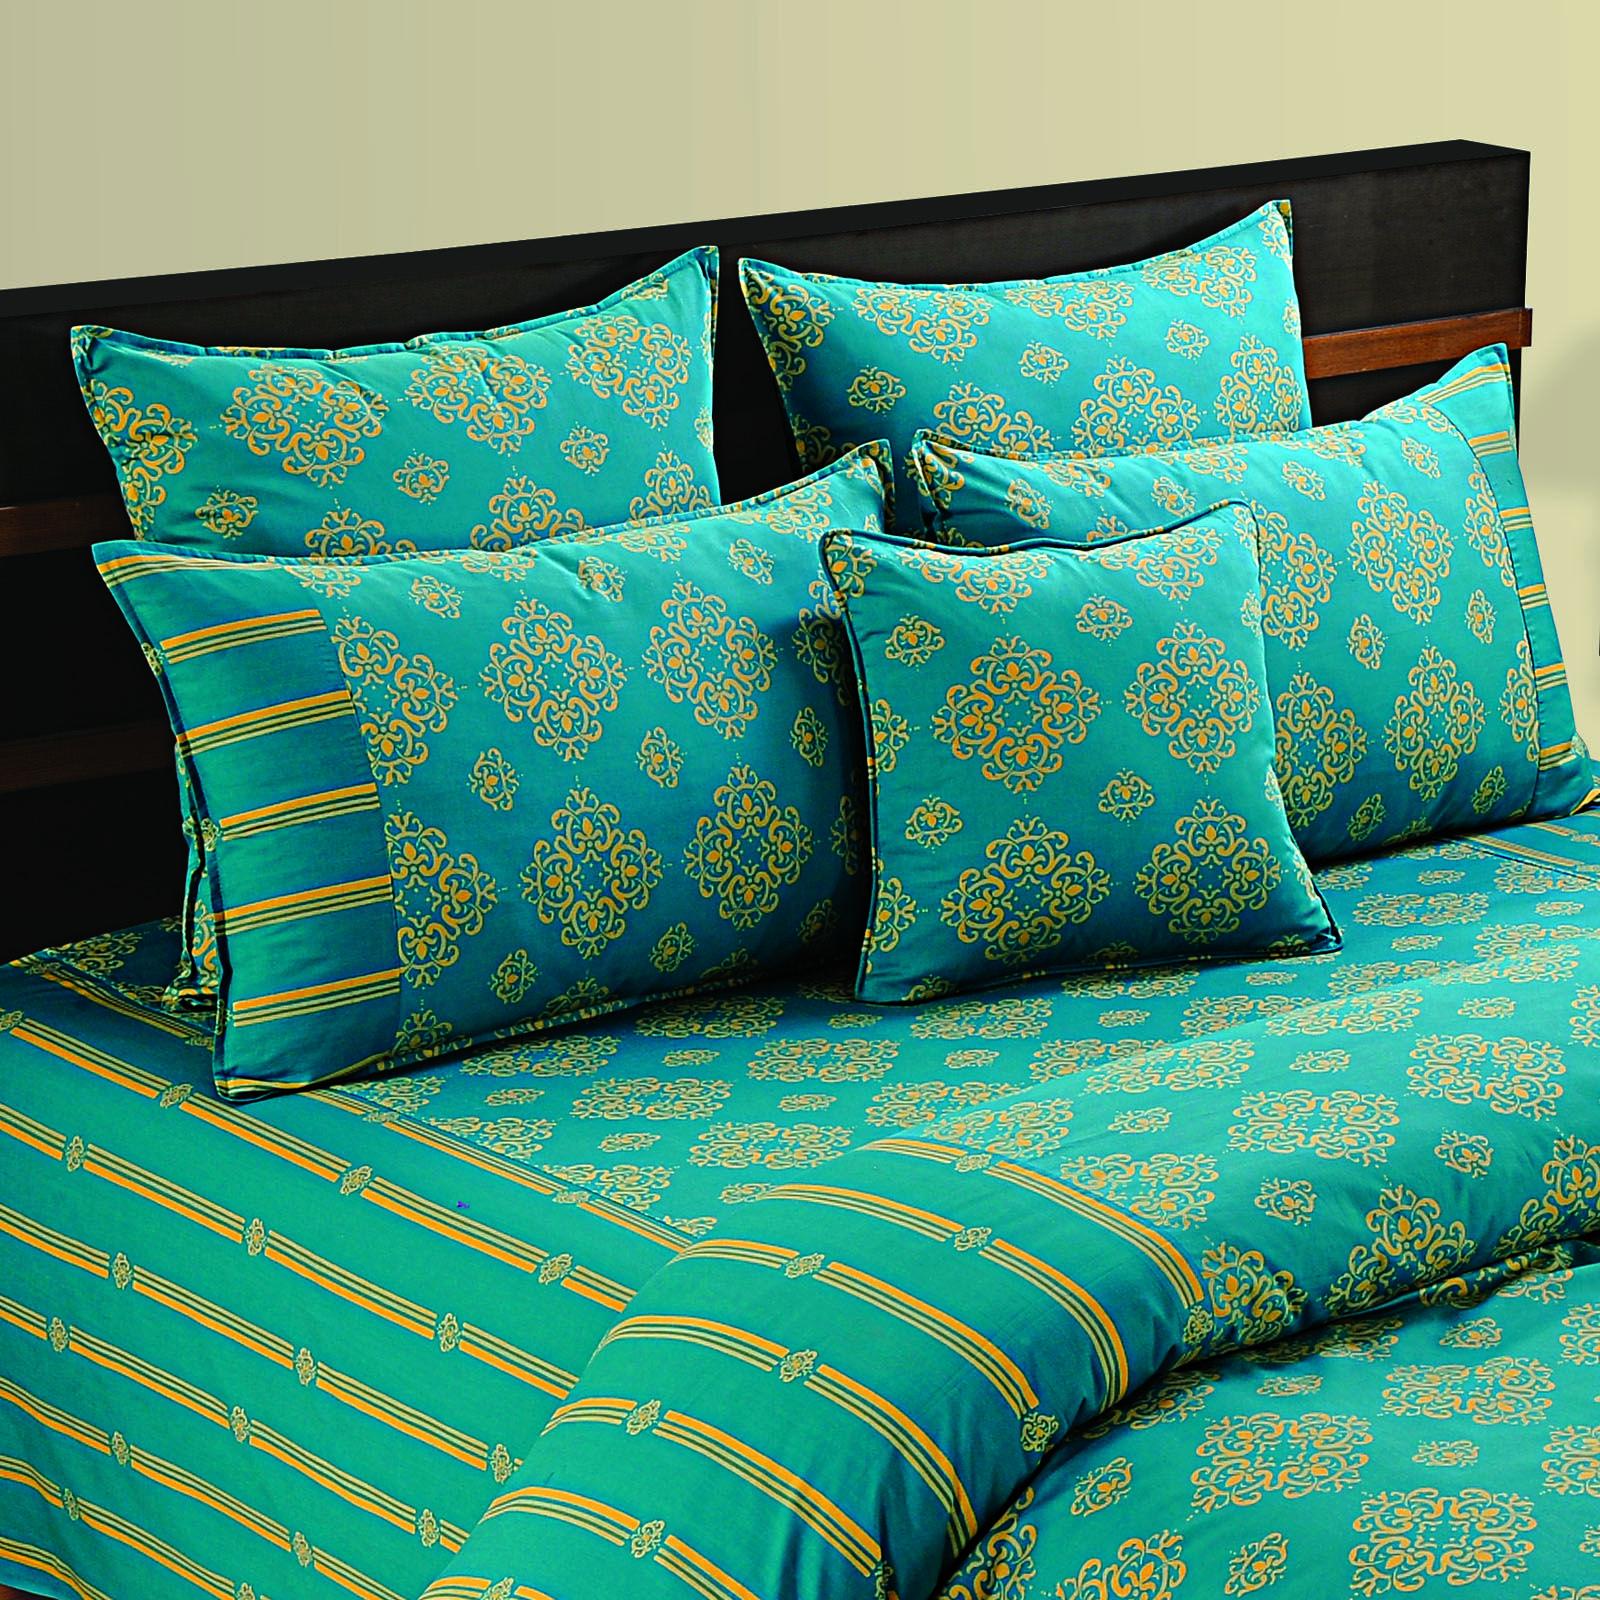 Details about 100 Cotton Twin Queen Size Home Decorative